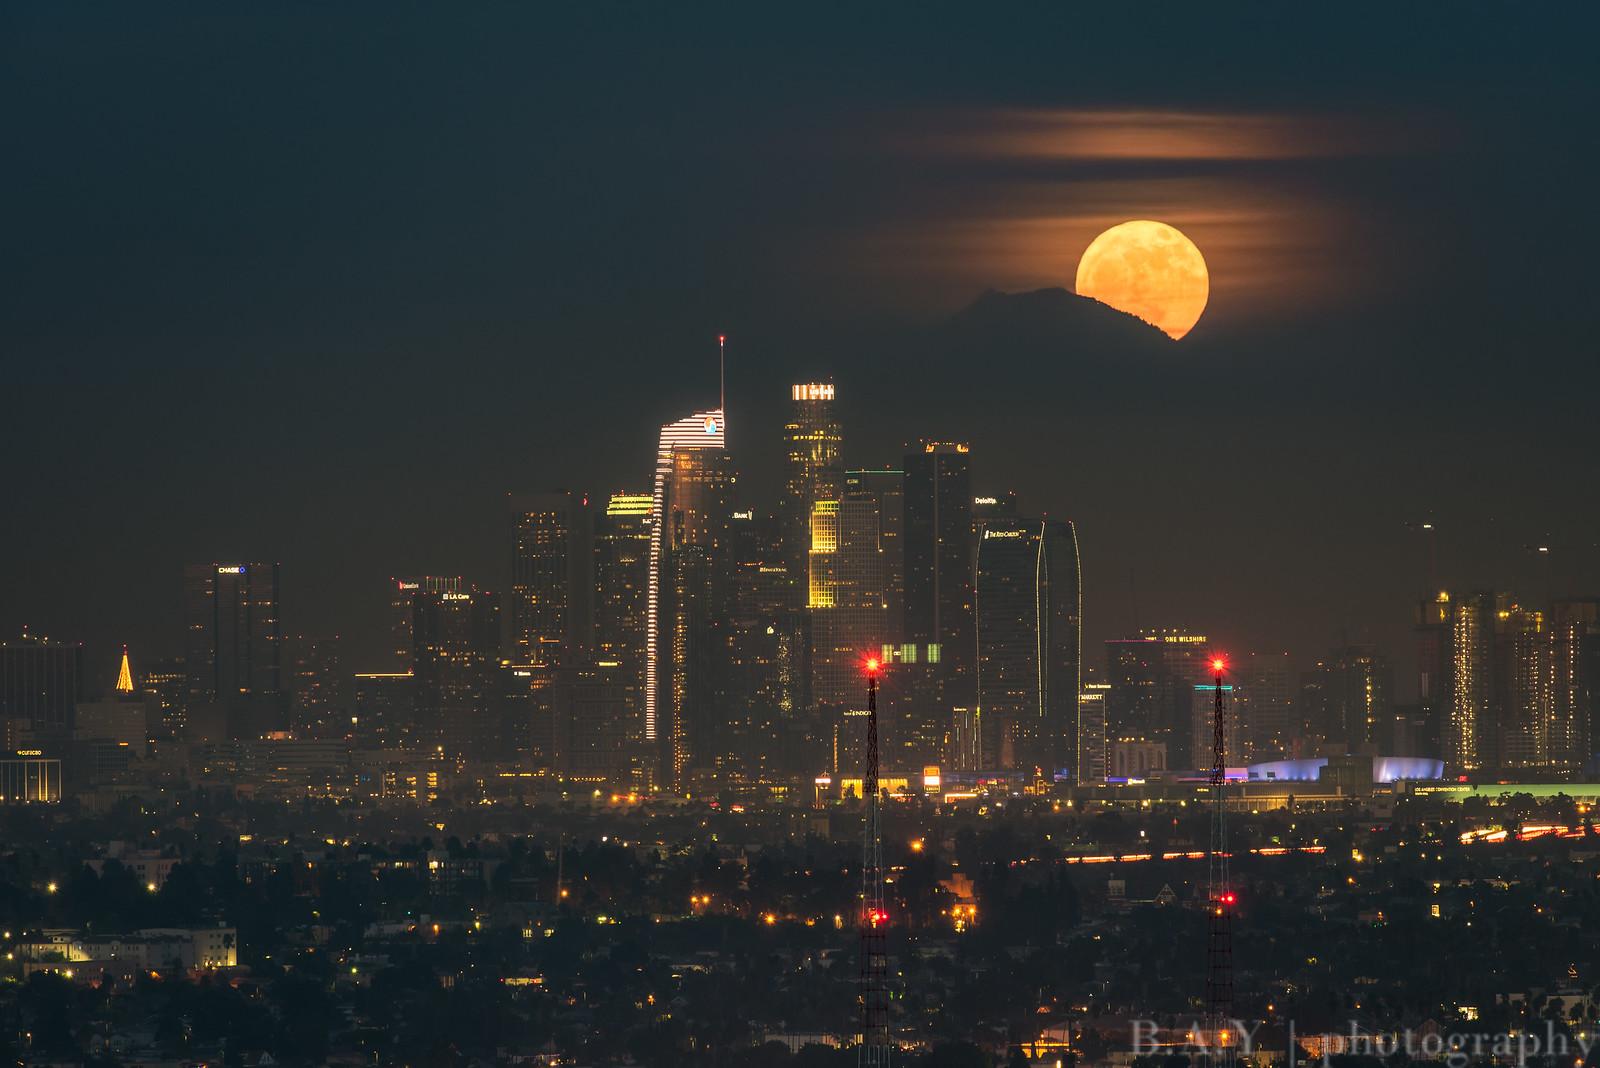 Supermoon rising, Los Angeles 2017